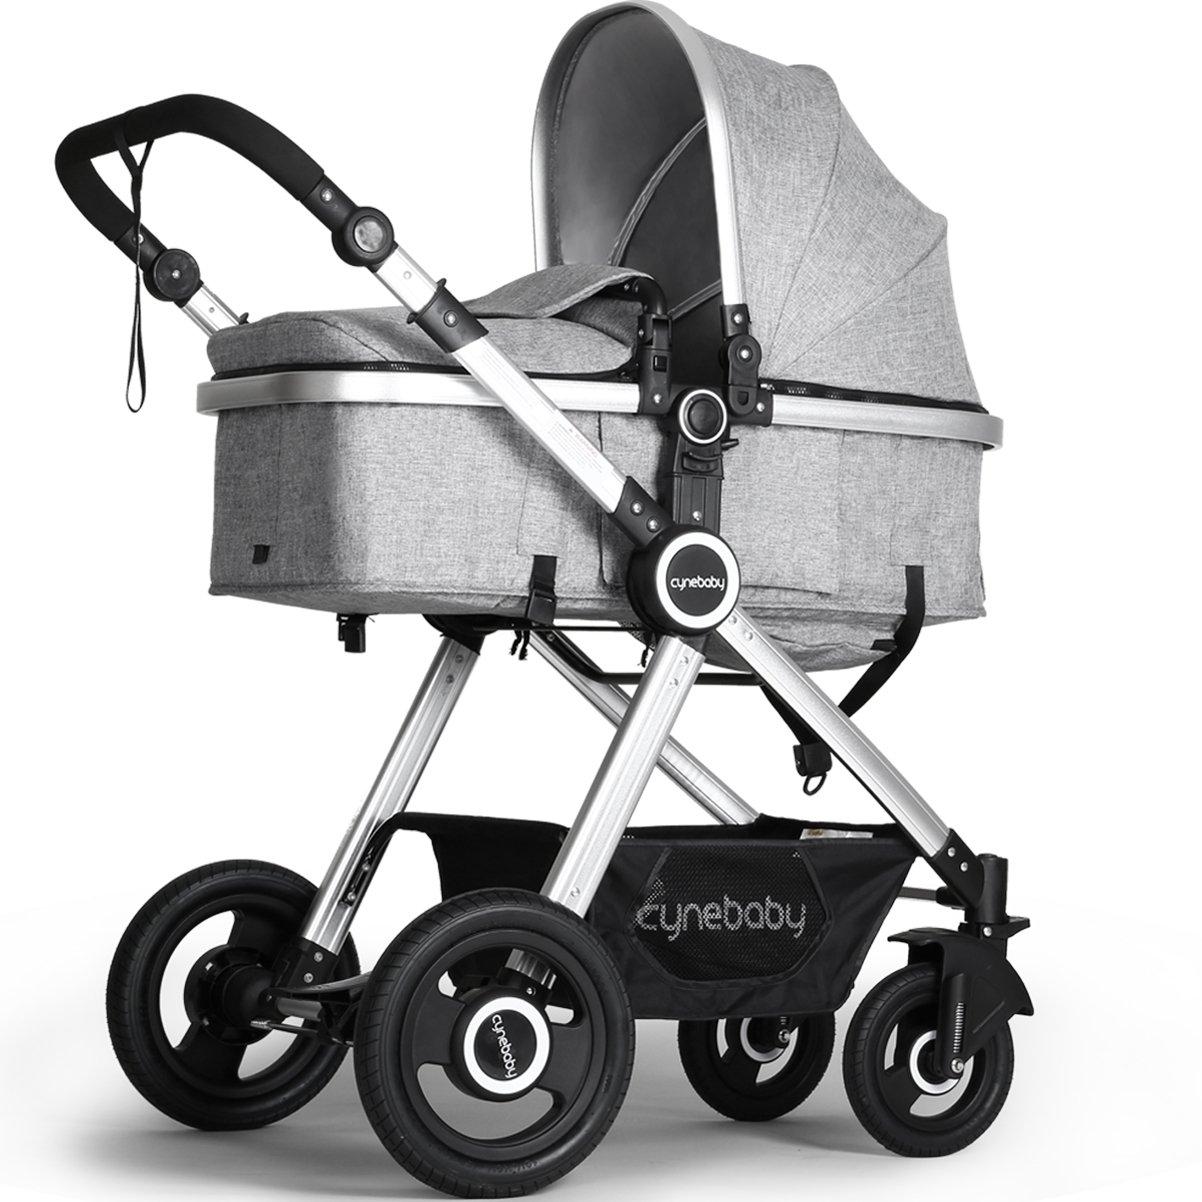 Newborn Baby Stroller Pram Stroller Folding Convertible Carriage Luxury Bassinet Seat Infant Pushchair with Foot Muff(Grey)